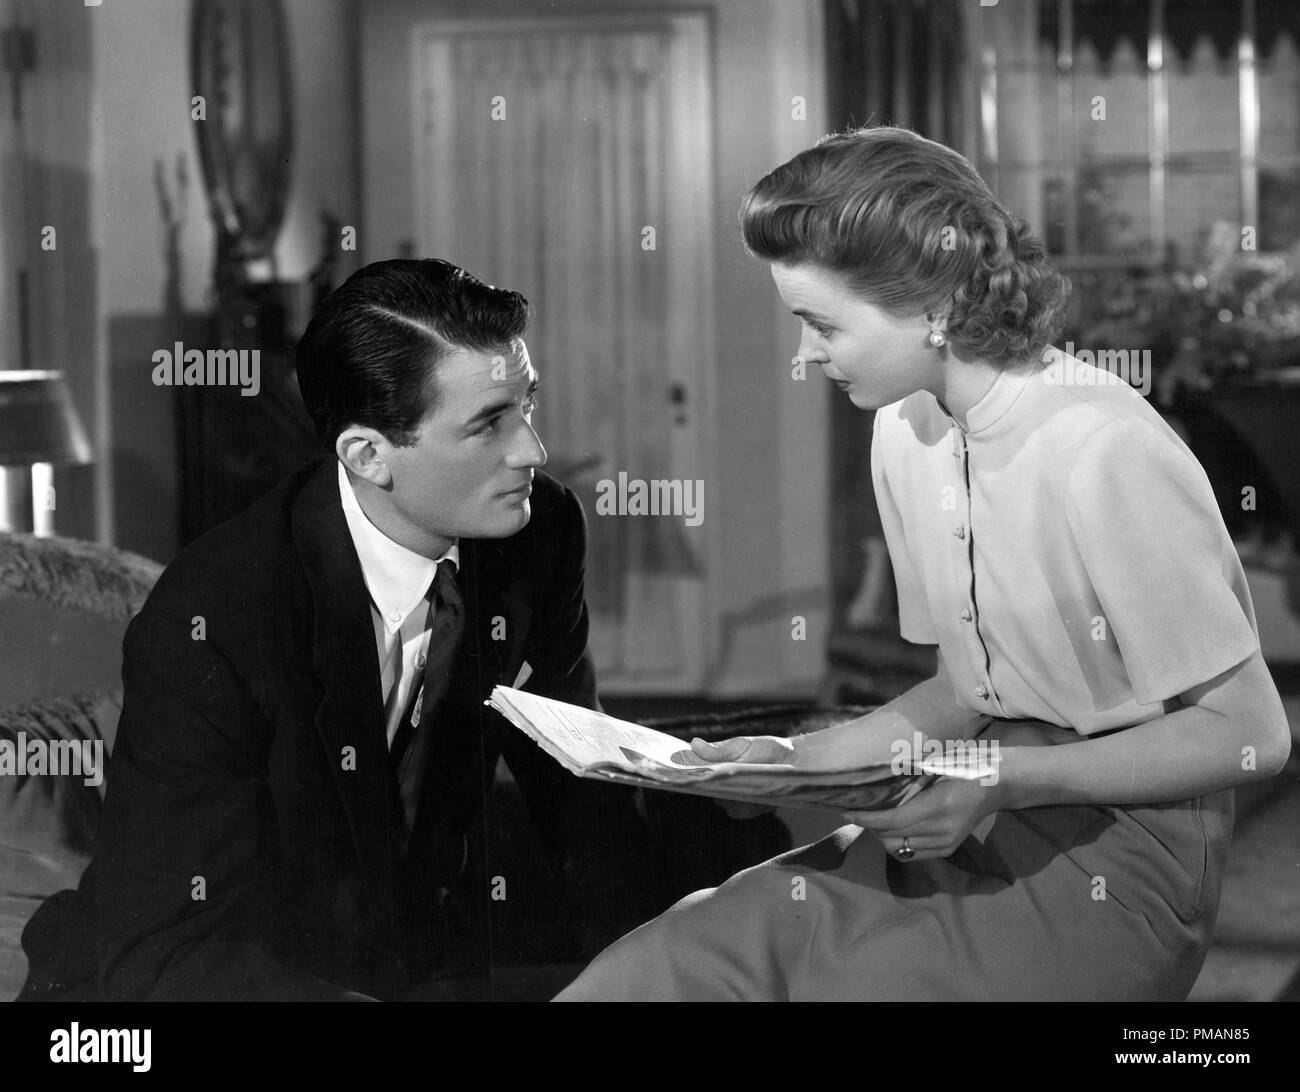 Film Stillpublicity Still Of Gentlemans Agreement Gregory Peck